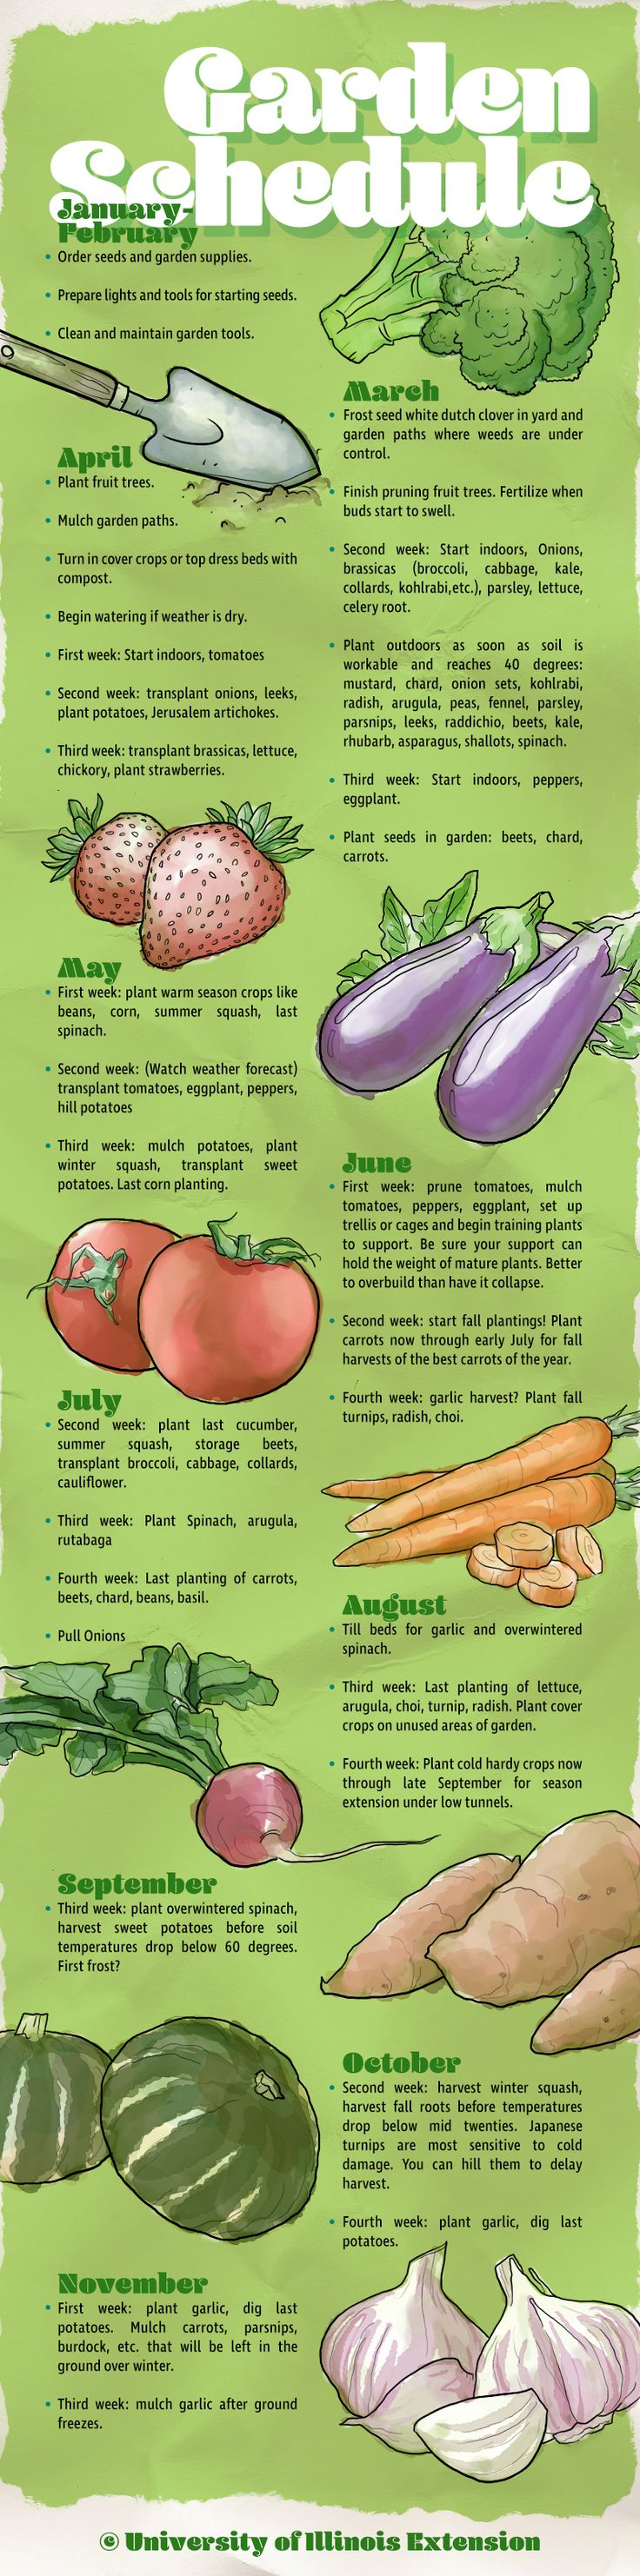 Tomato marmande agm seeds d t brown vegetable seeds - Best Vegetable Garden Design Ideas On Pinterest Vege Garden Design Raised Garden Bed Design And Garden